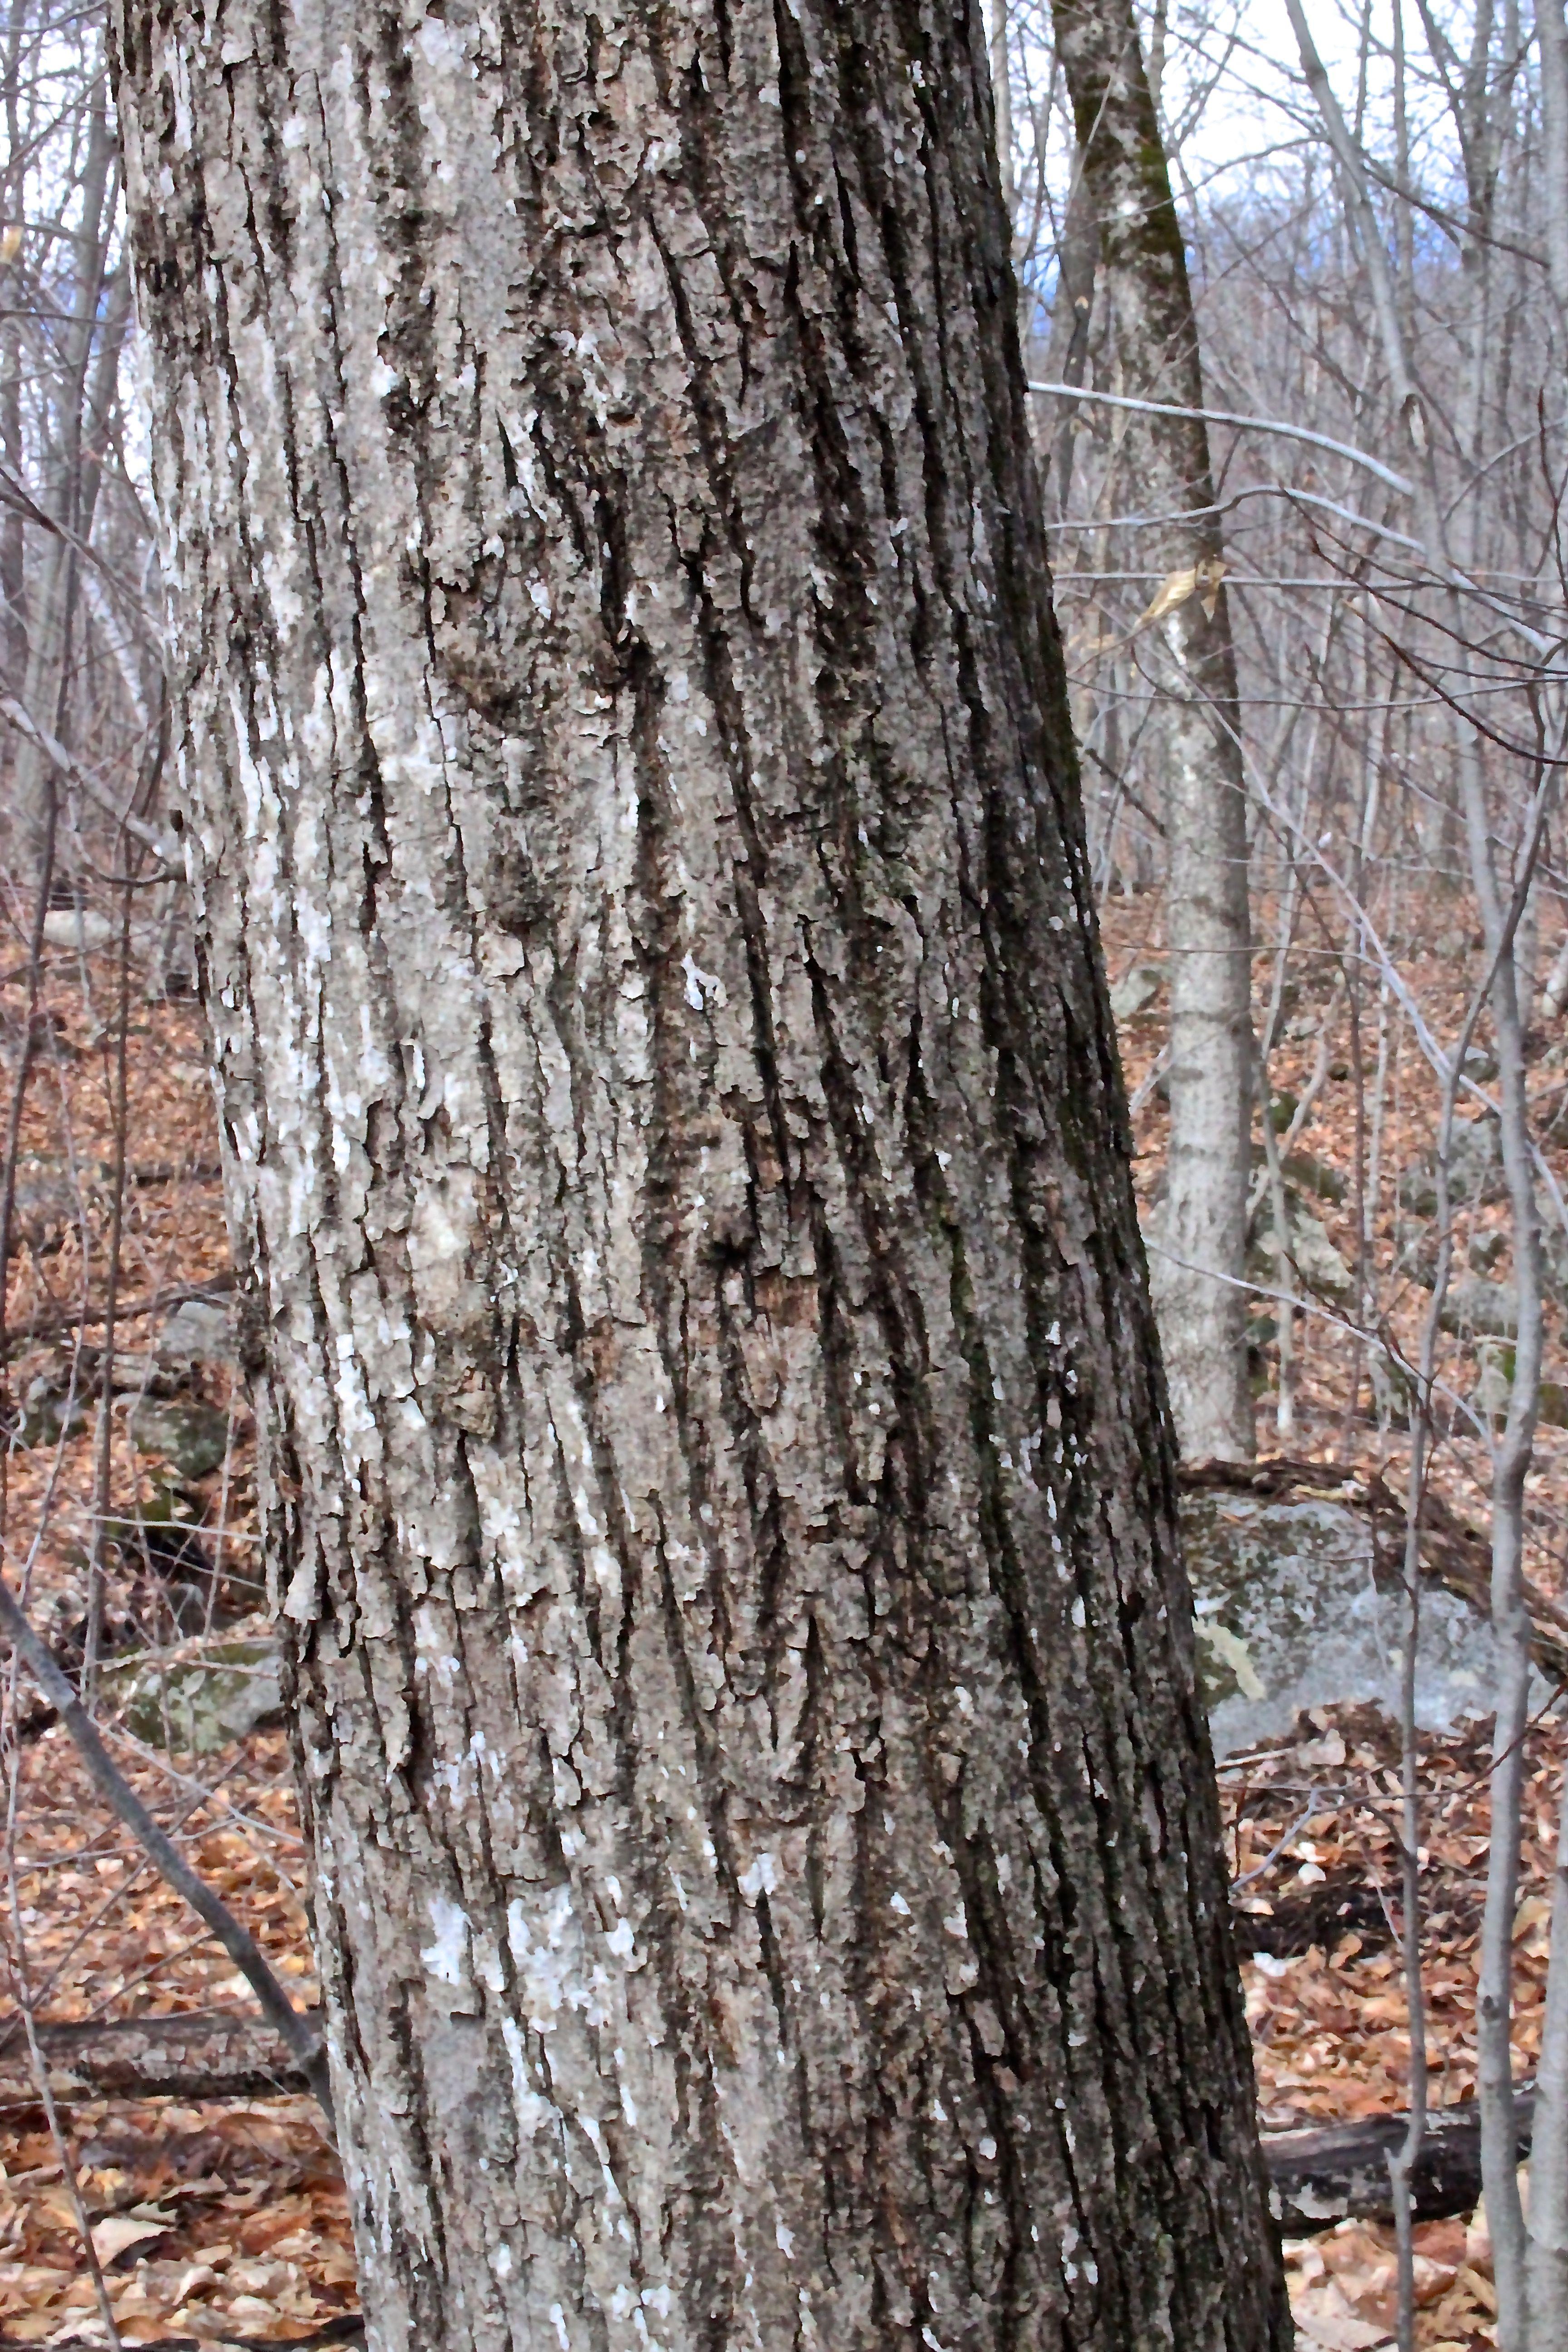 b-basswood bark